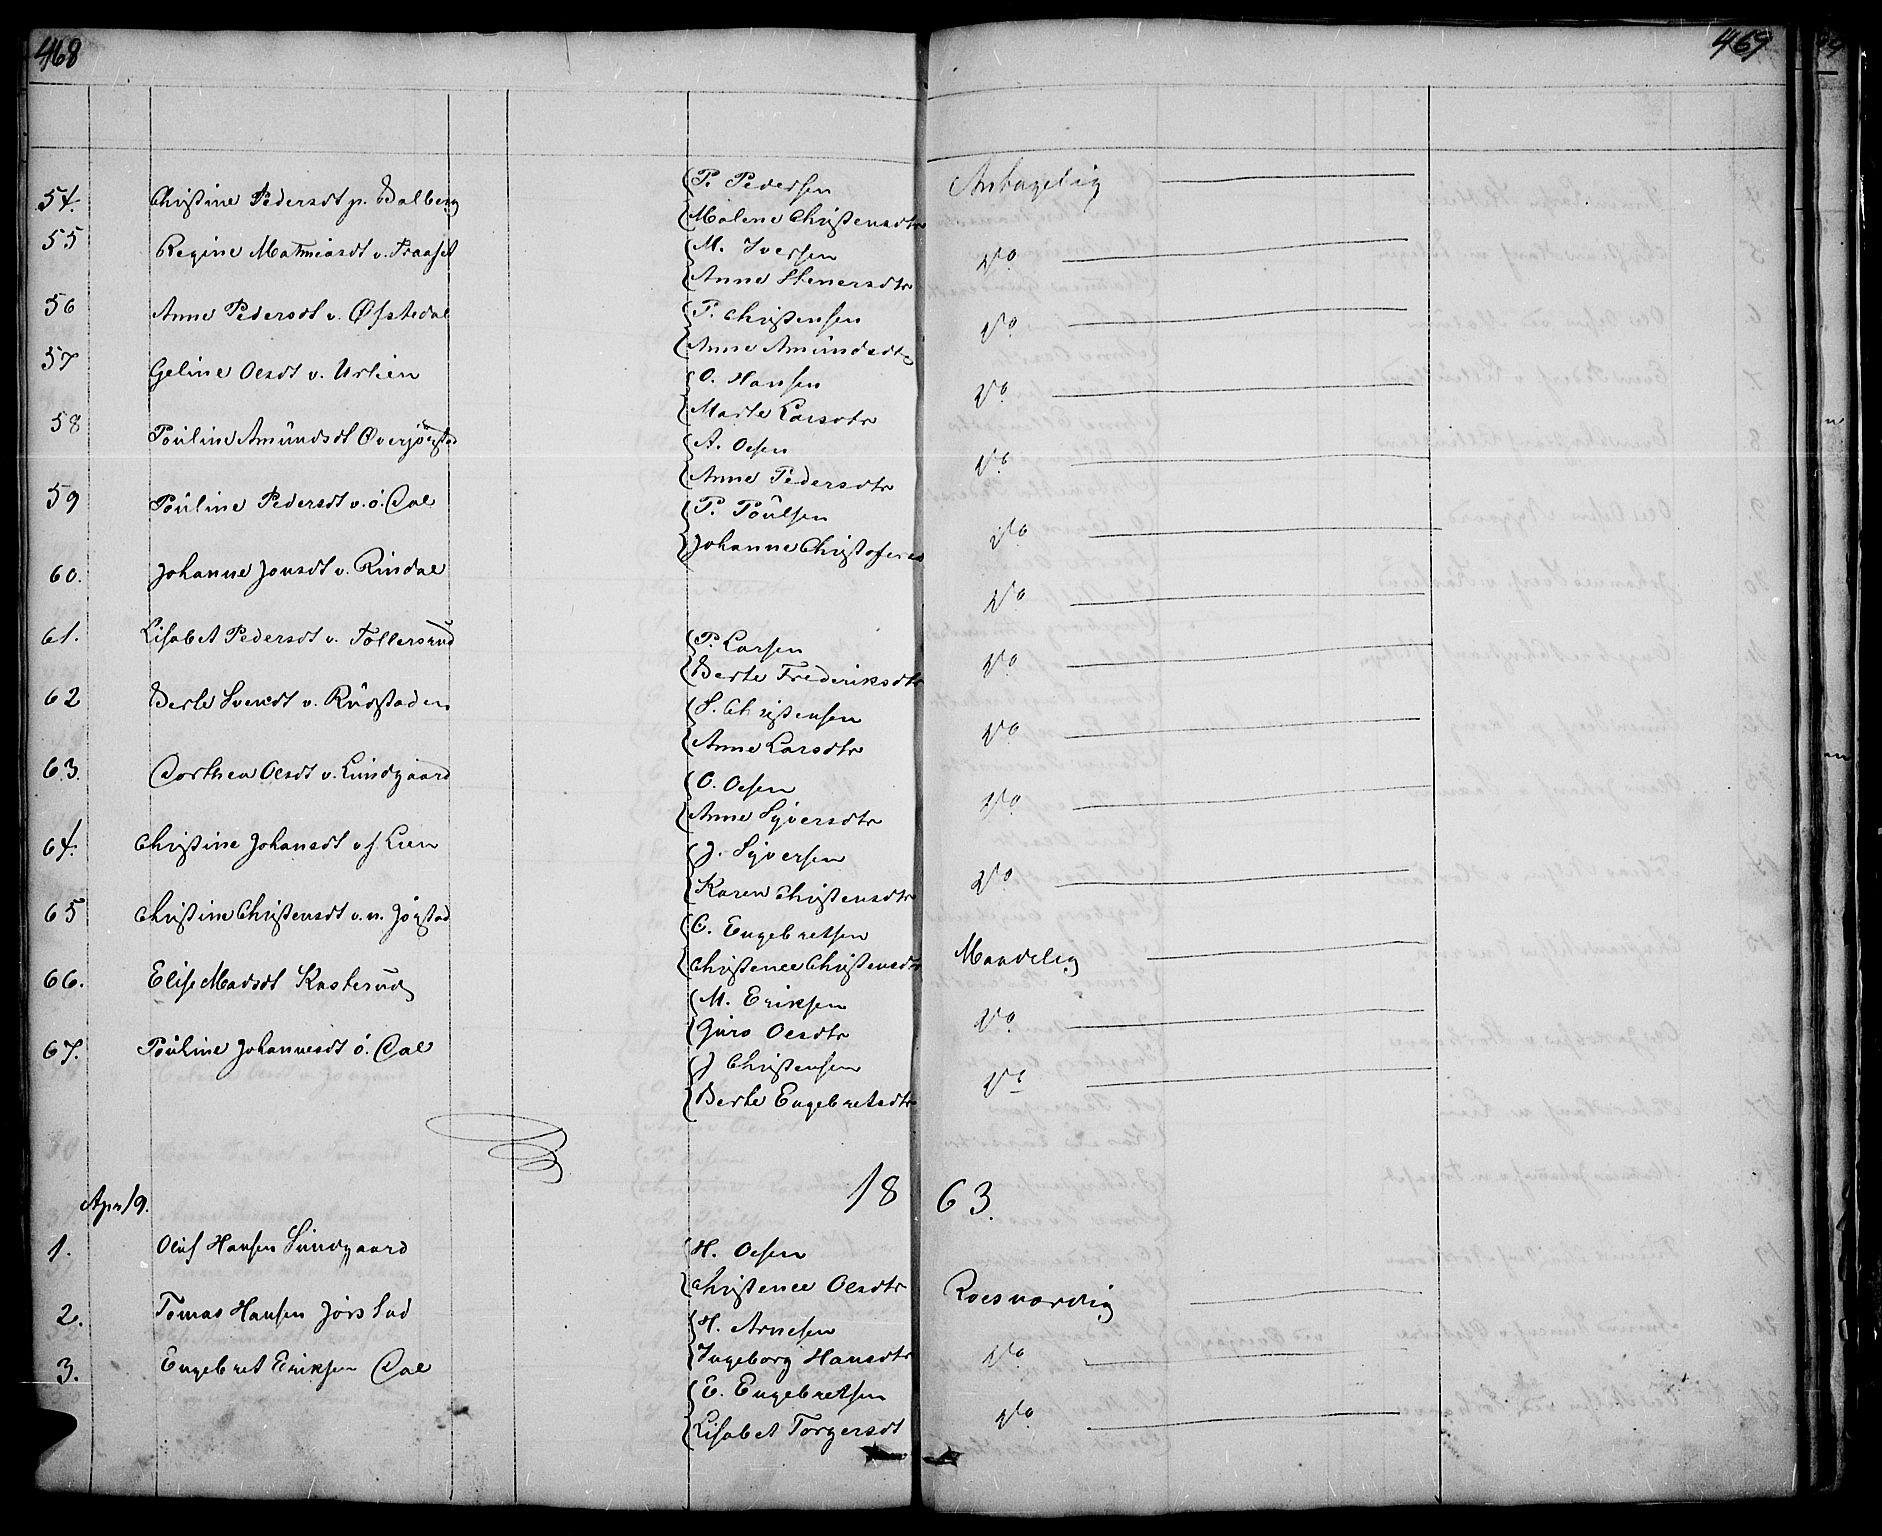 SAH, Fåberg prestekontor, Klokkerbok nr. 5, 1837-1864, s. 468-469